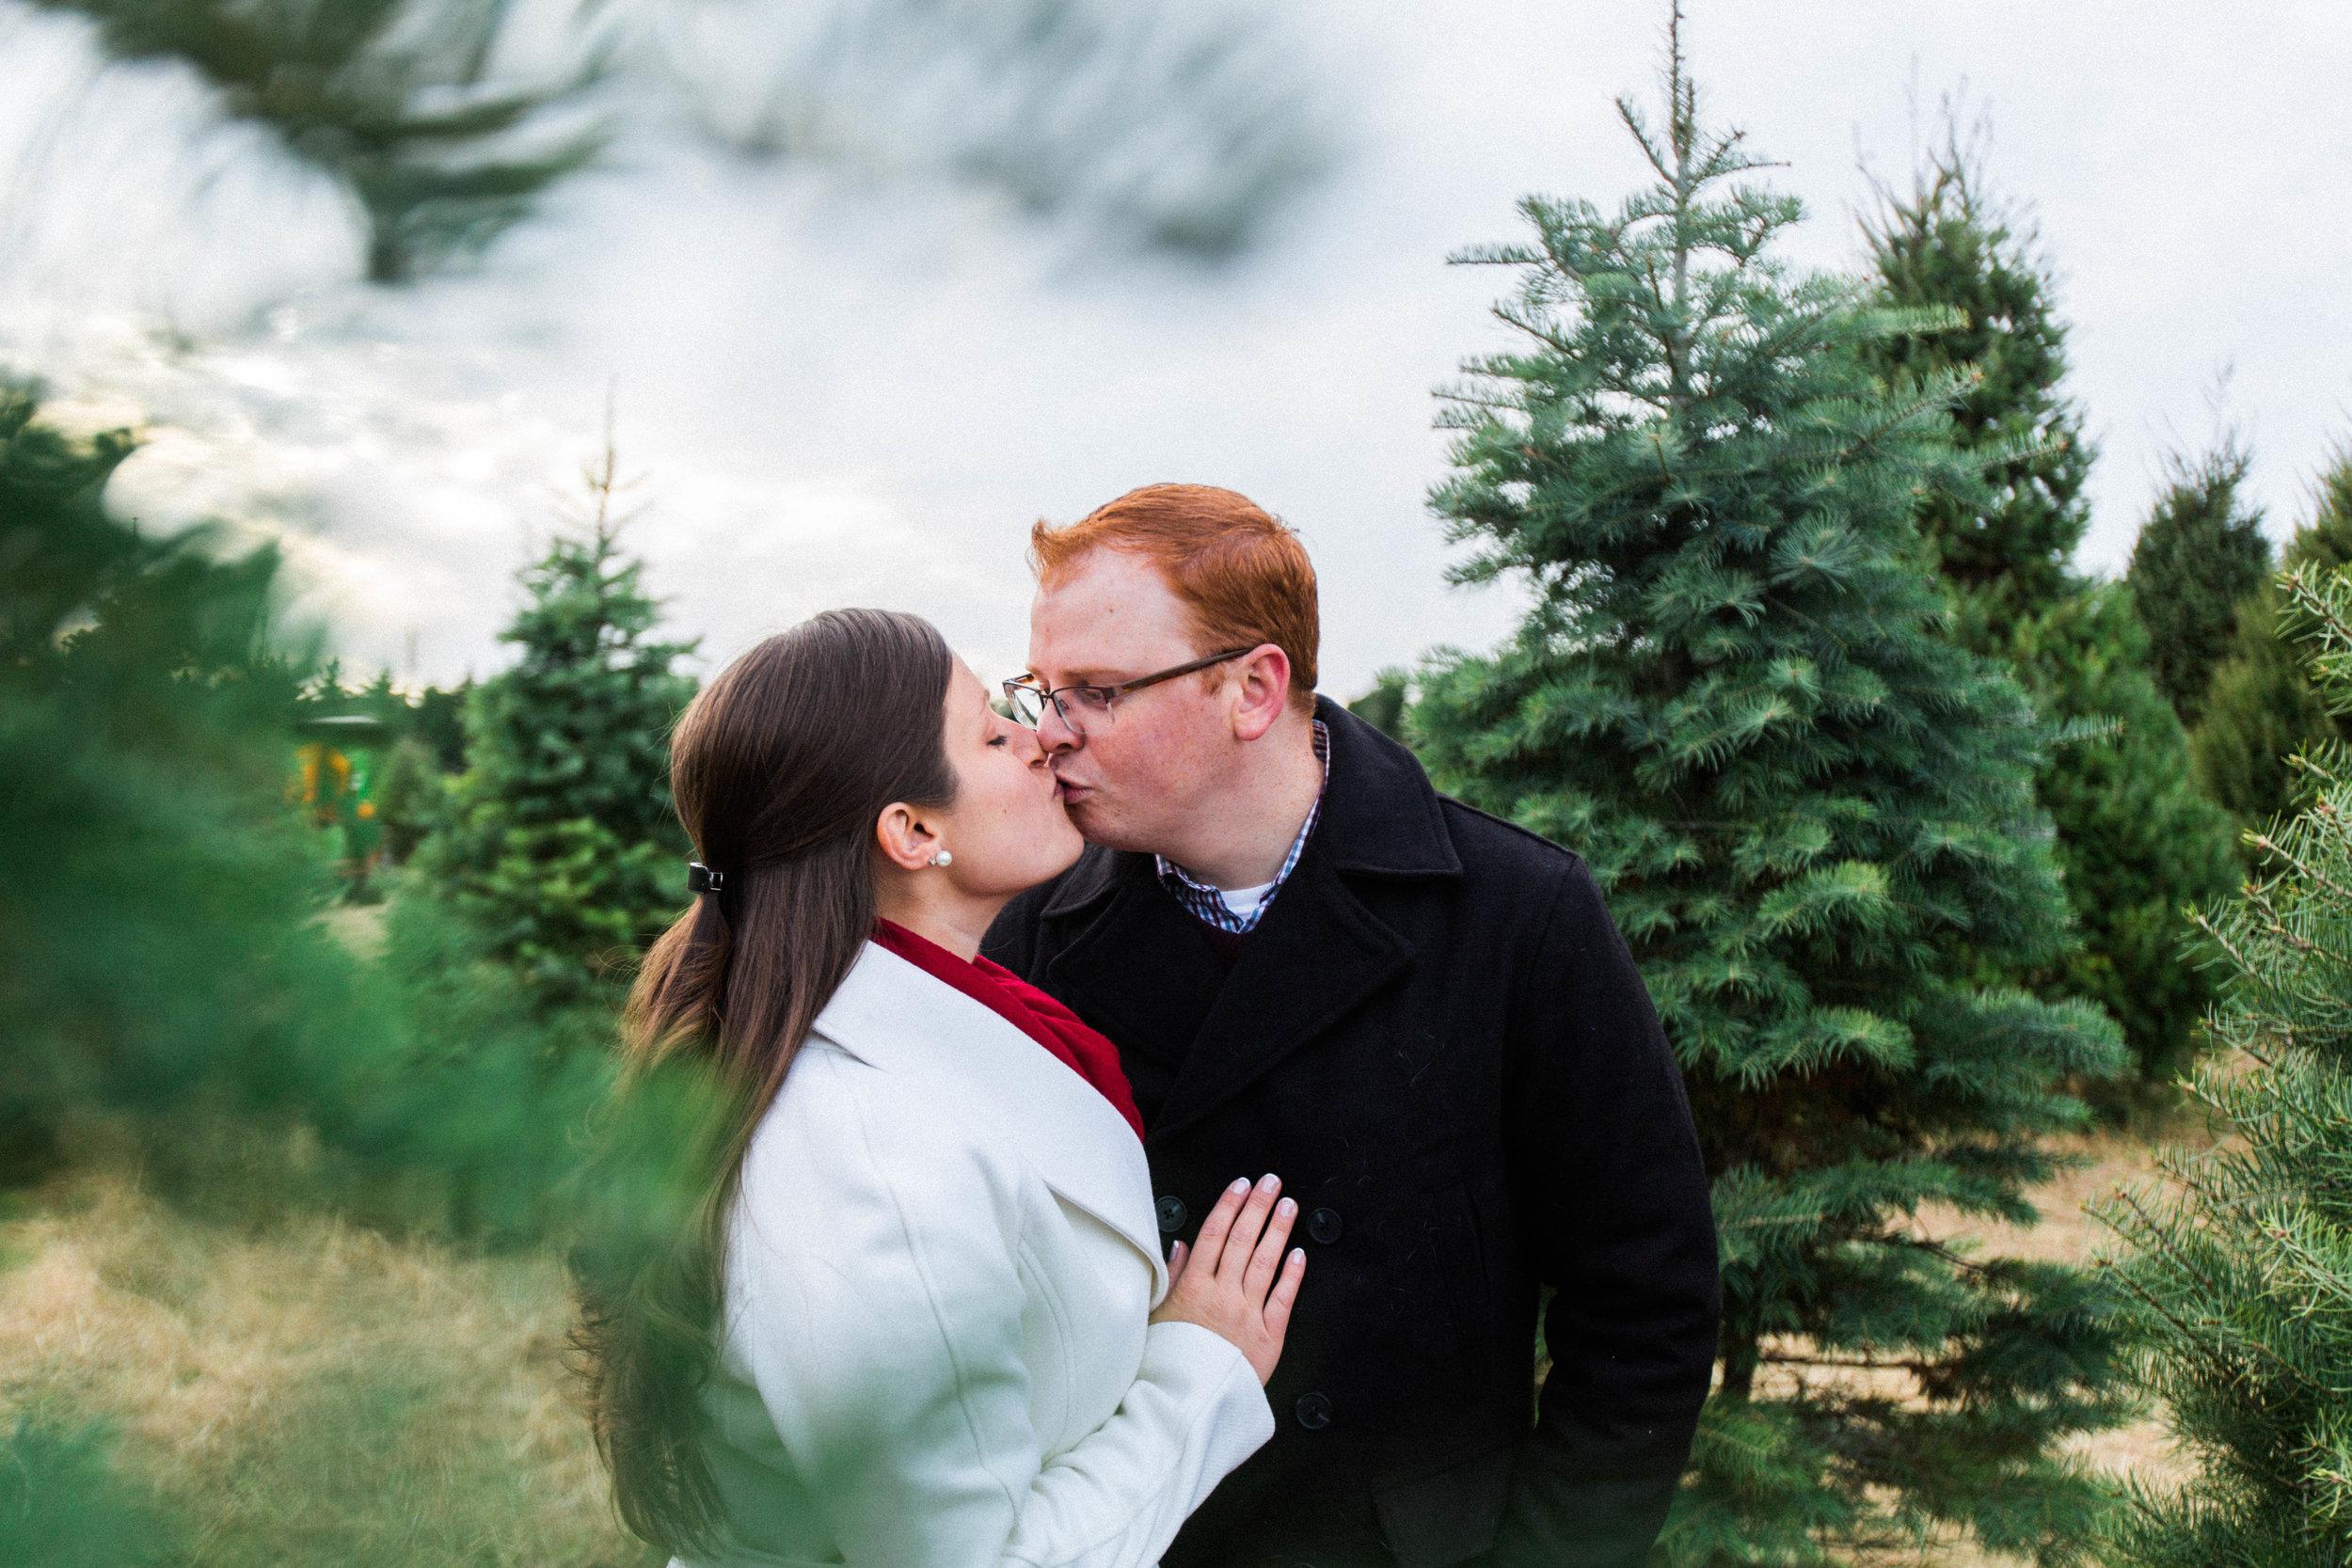 CHRISTMAS_TREE_FARM_ENGAGEMENT_PHOTOS--0044.jpg